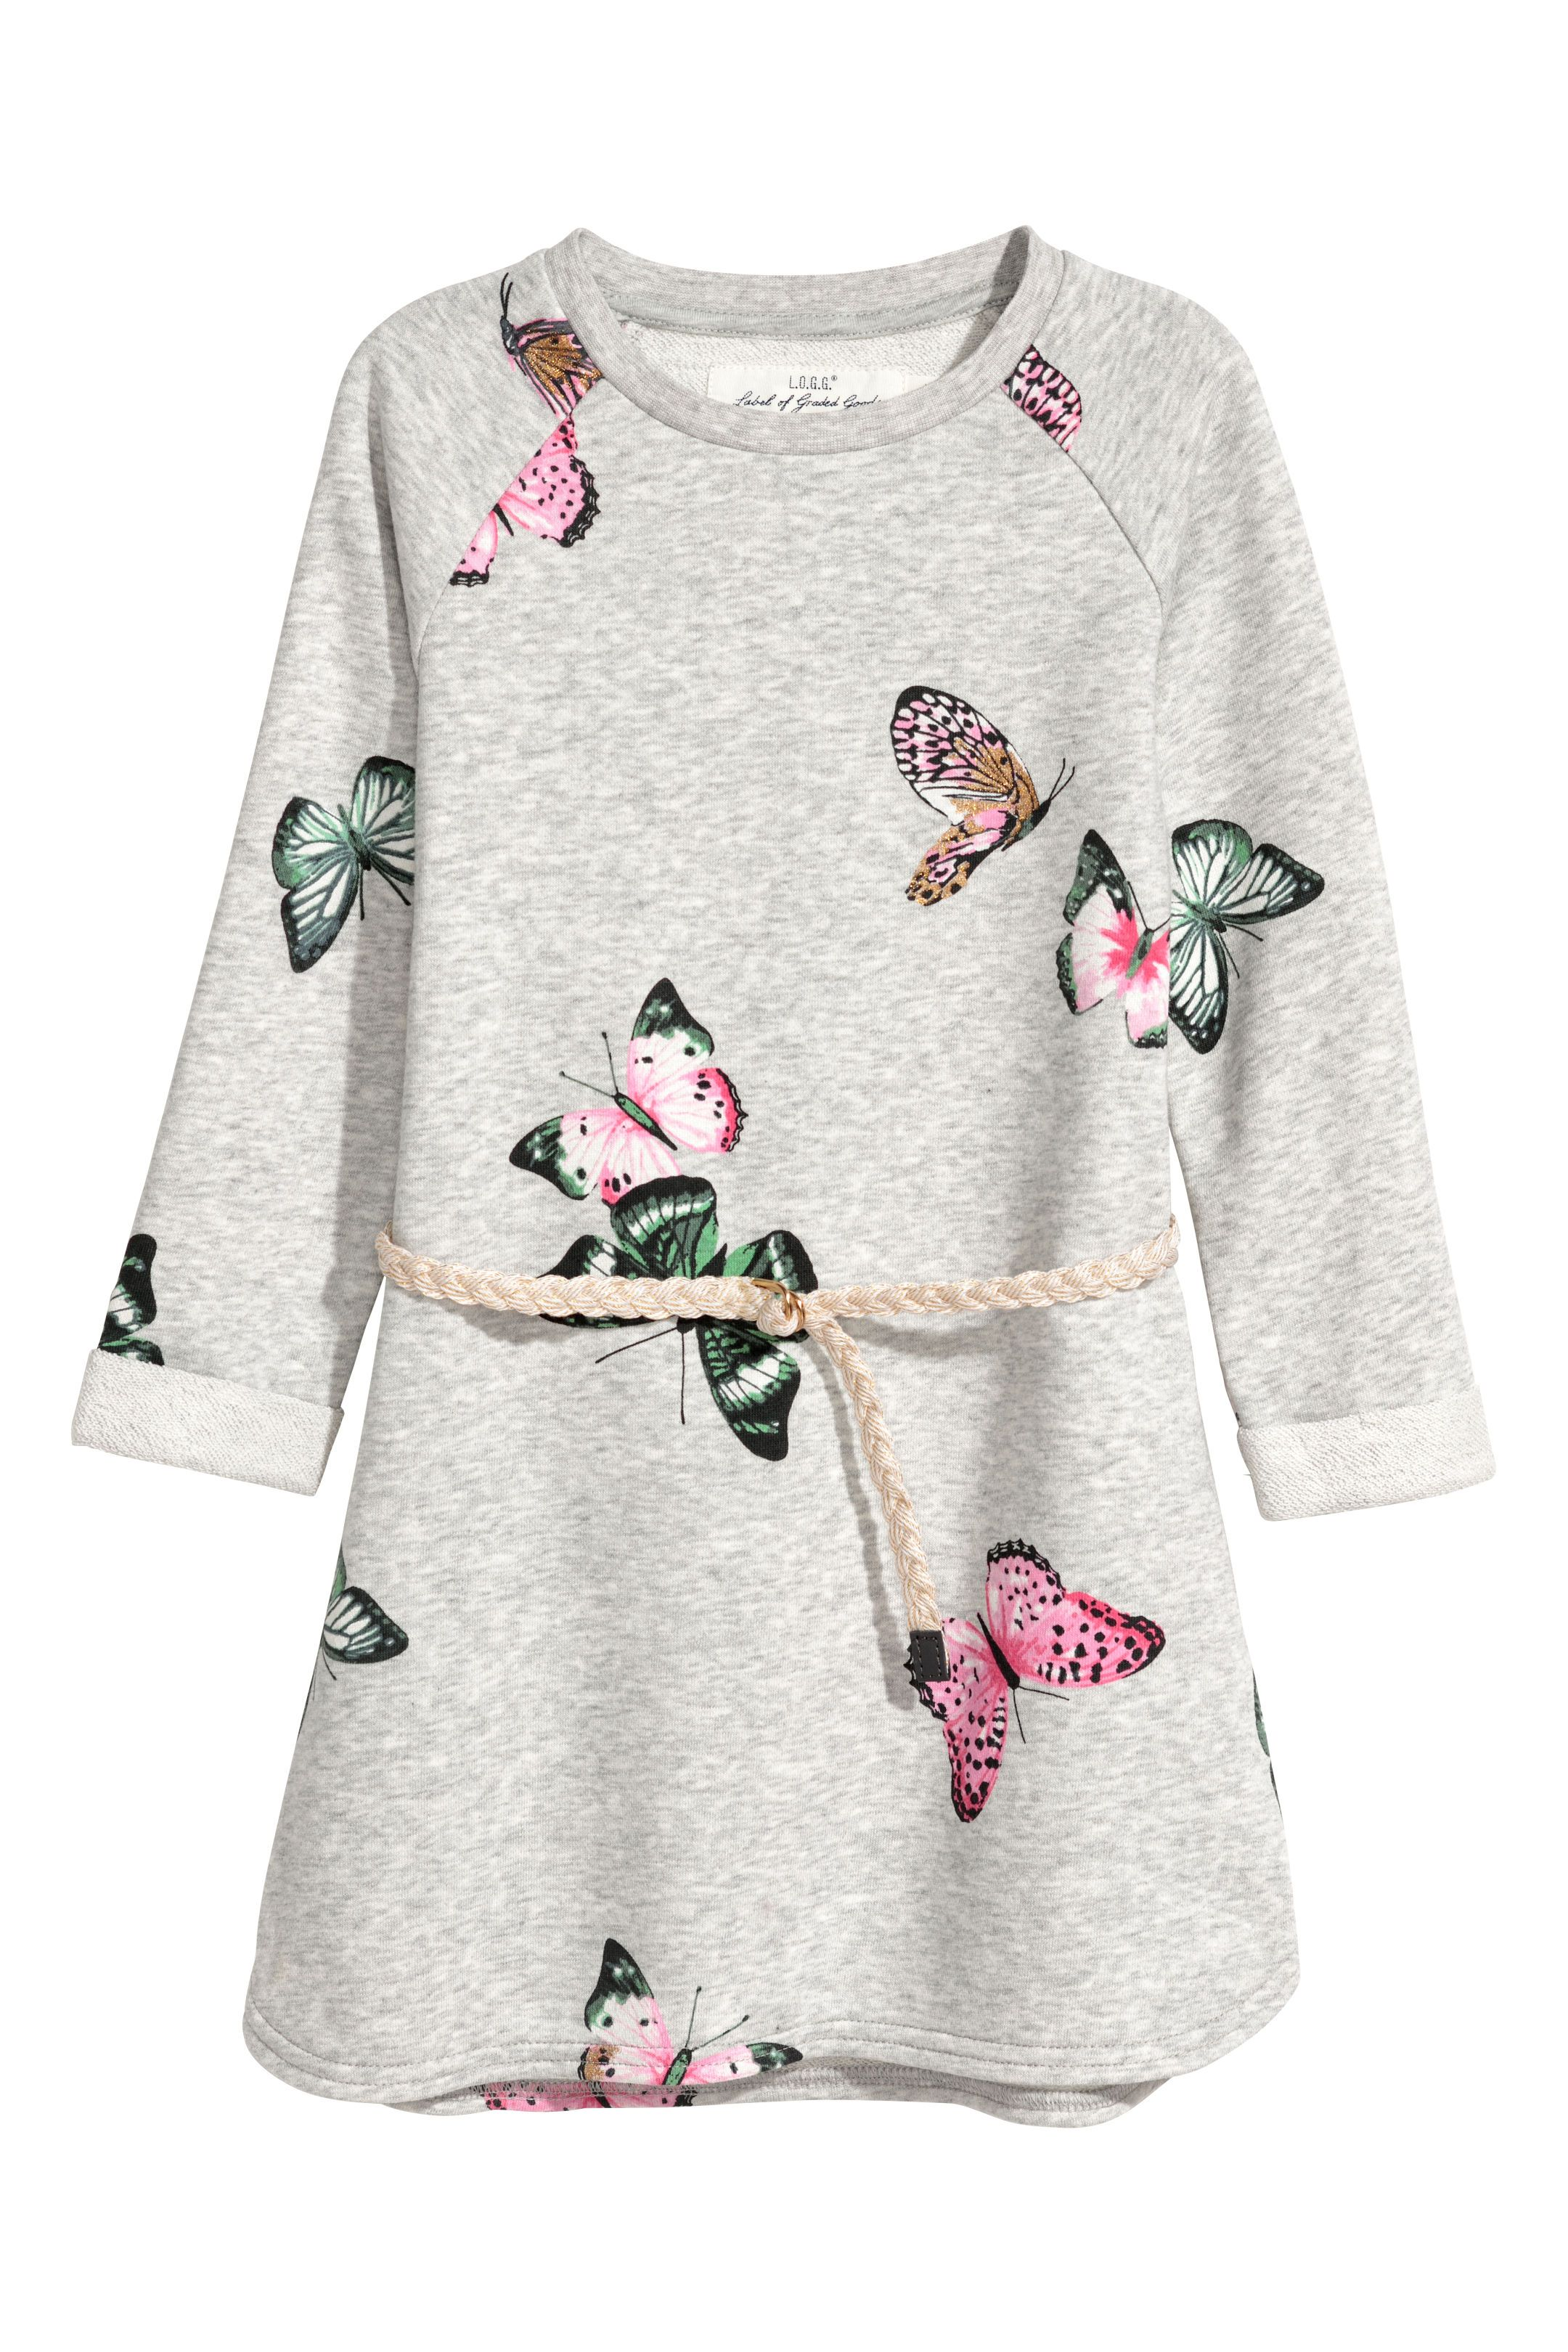 db3e4fd86f03 H&M Sweatshirt Dress - Gray   fall 2019 girls   Toddler outfits ...